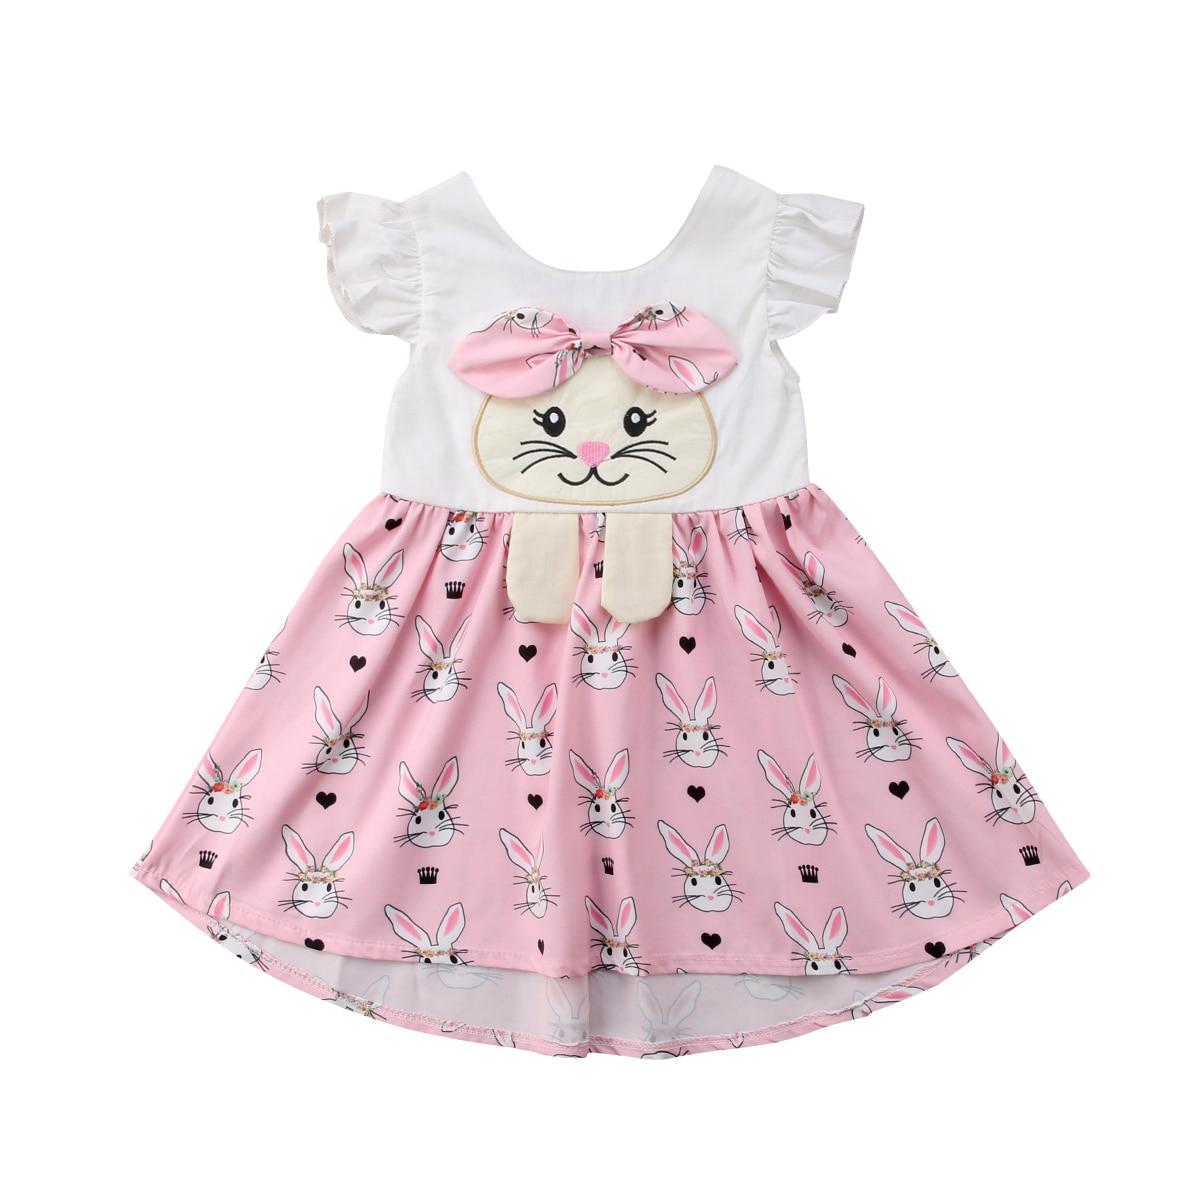 Sister Matching Easter Kids Baby Girls Bunny Romper Dress